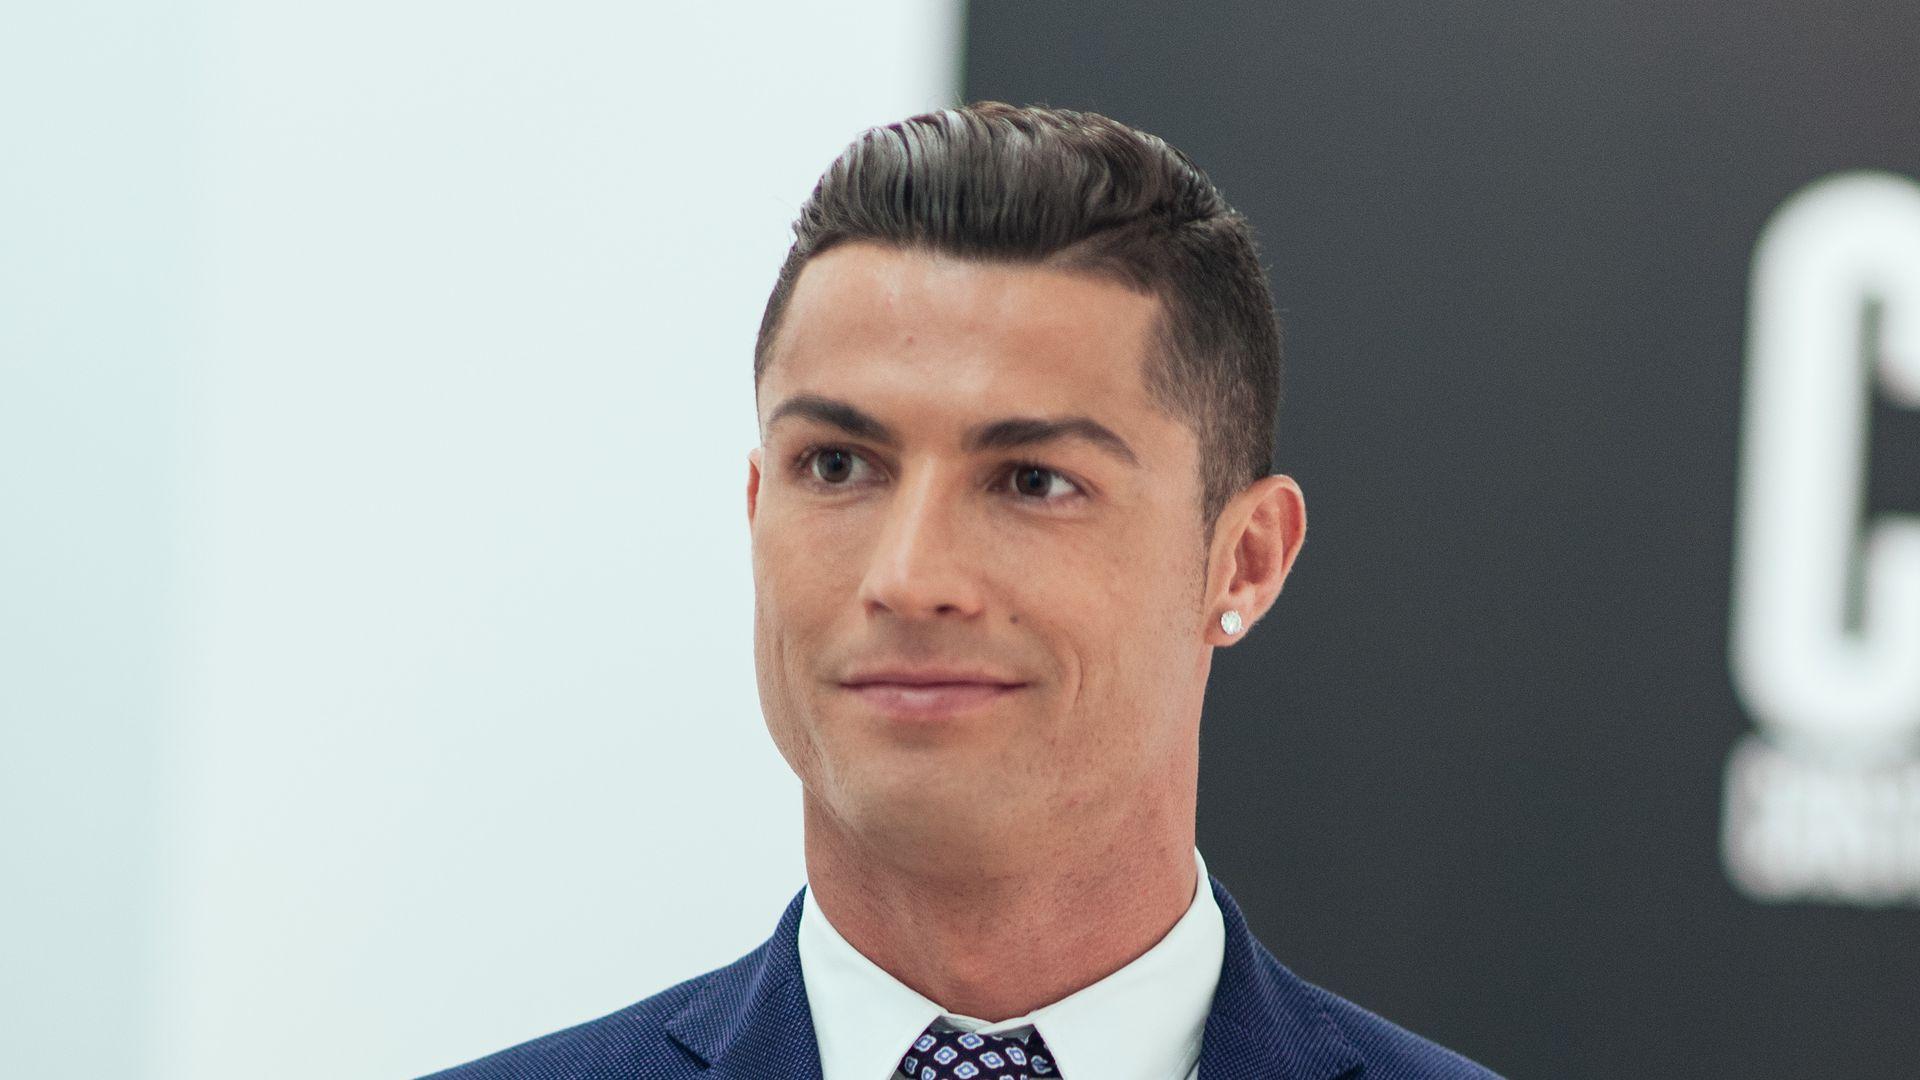 Hat Ronaldo Corona